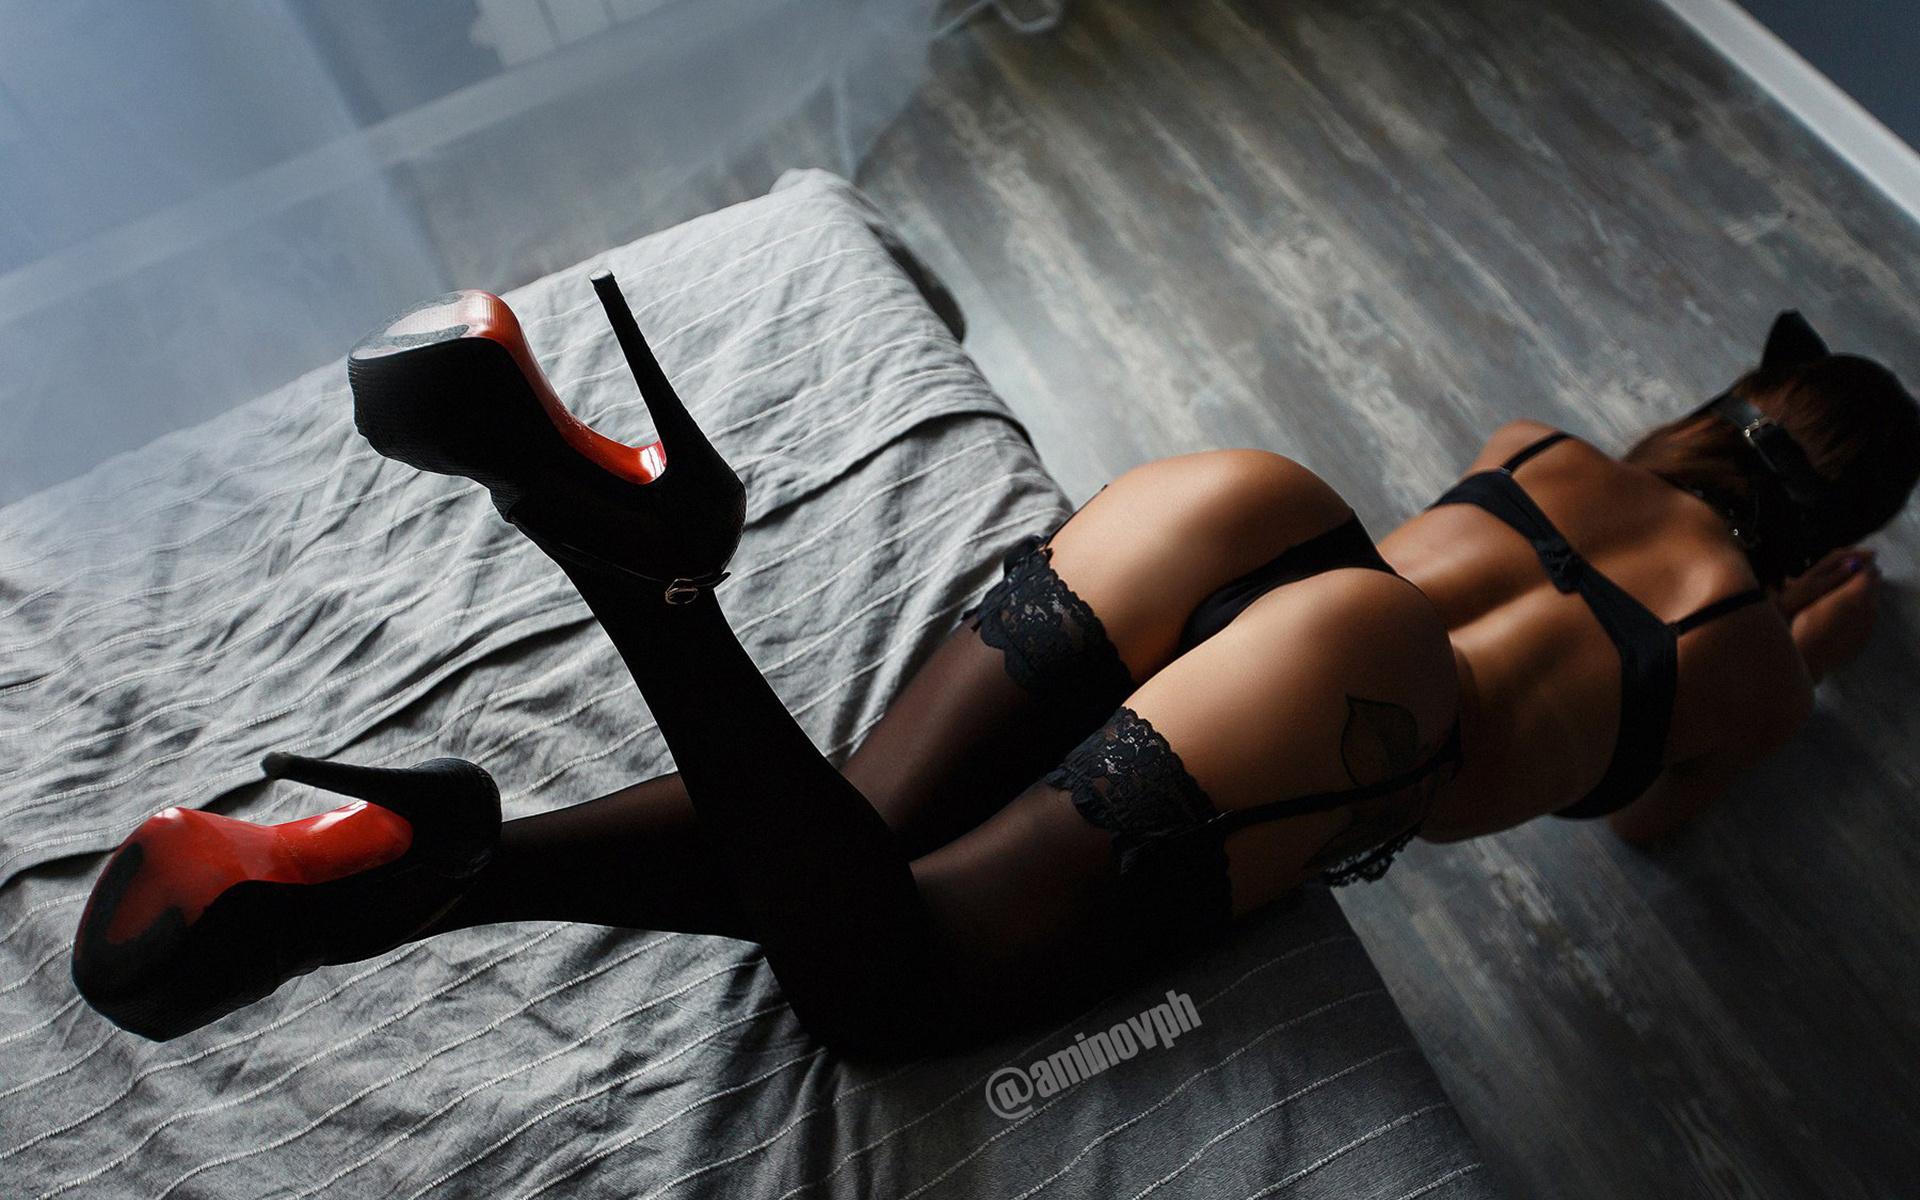 Black sexy metal studs platforms stiletto super high heels shoes